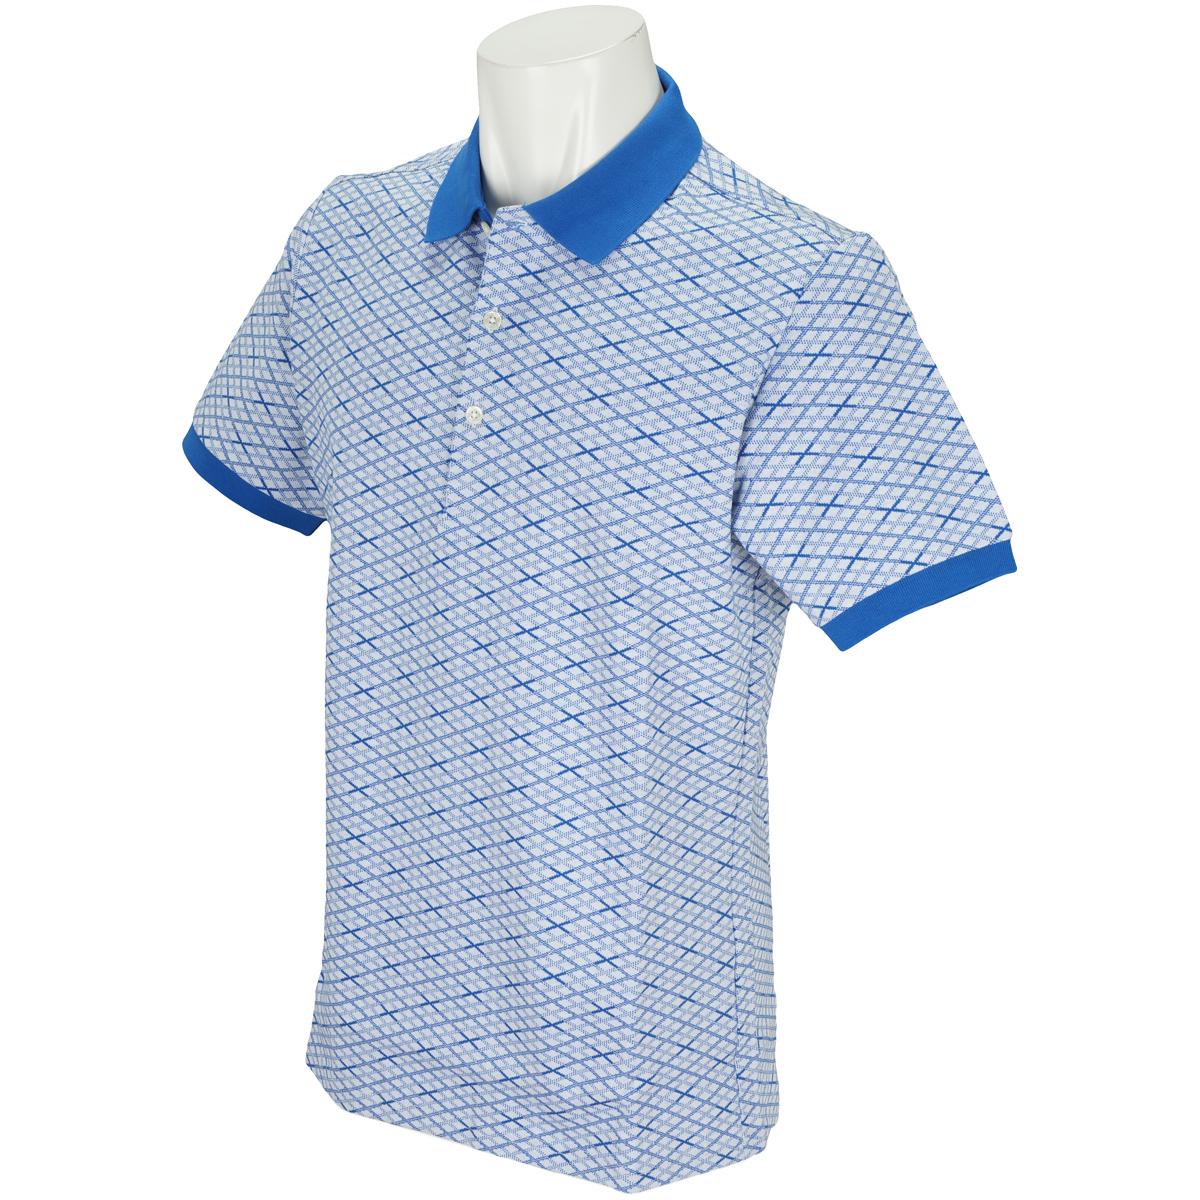 WhiteLabel クロス 半袖ポロシャツ